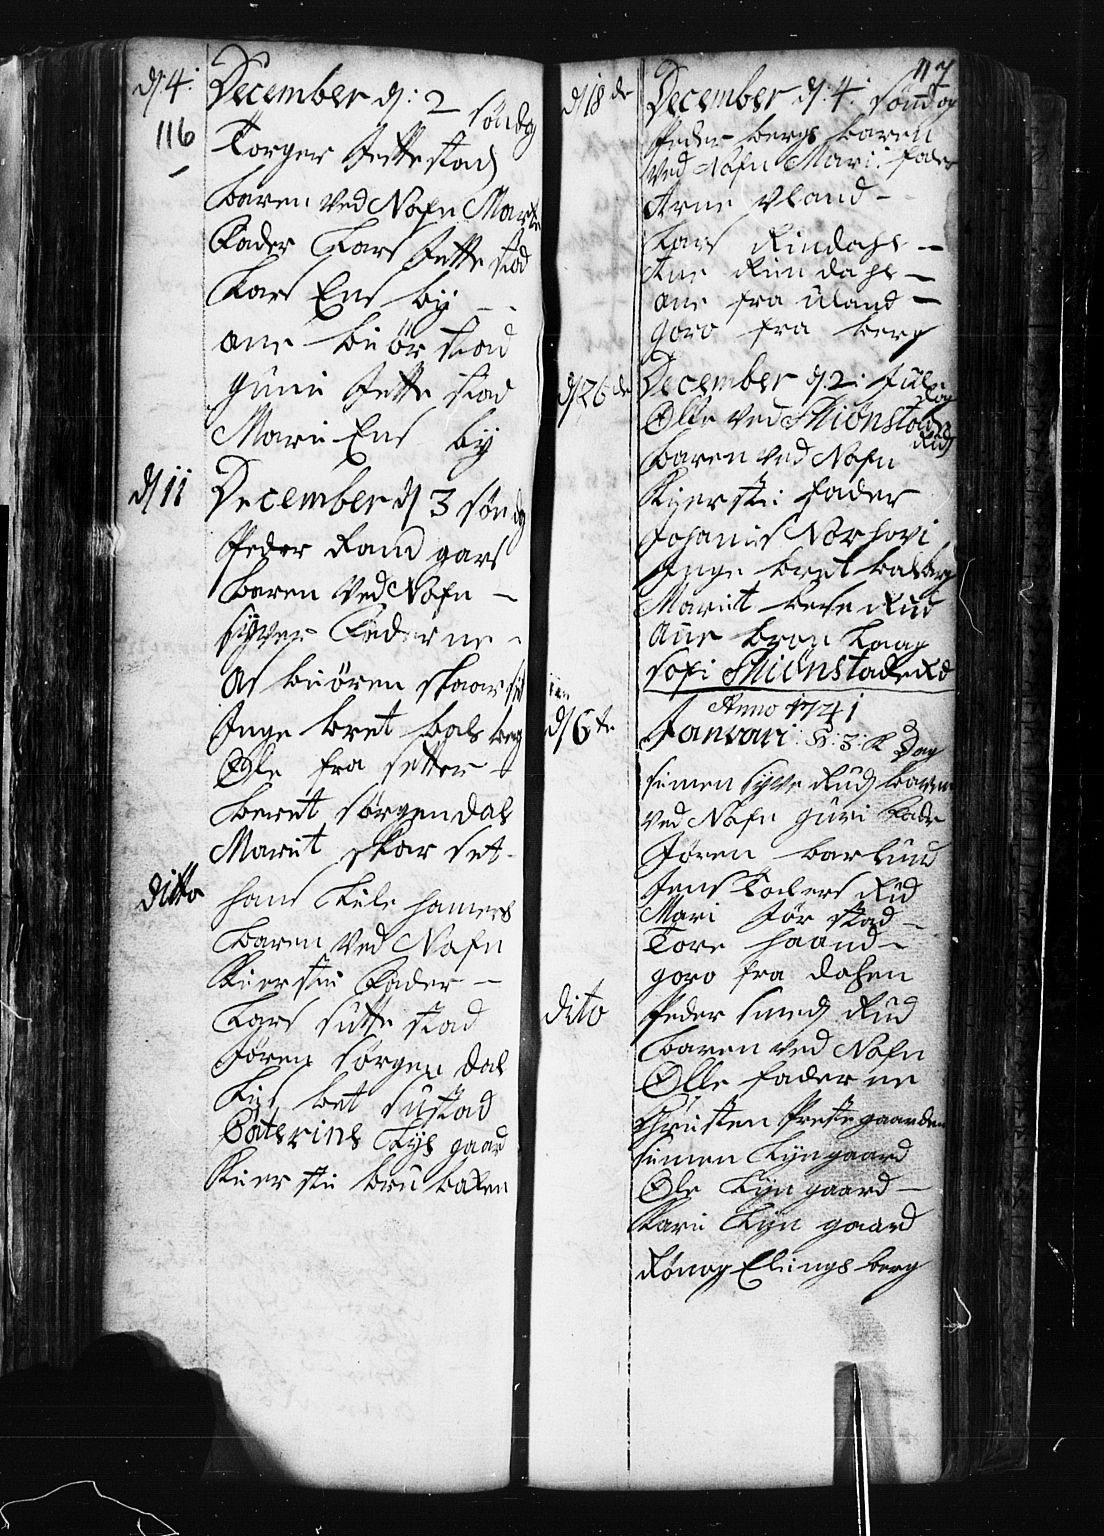 SAH, Fåberg prestekontor, Klokkerbok nr. 1, 1727-1767, s. 116-117